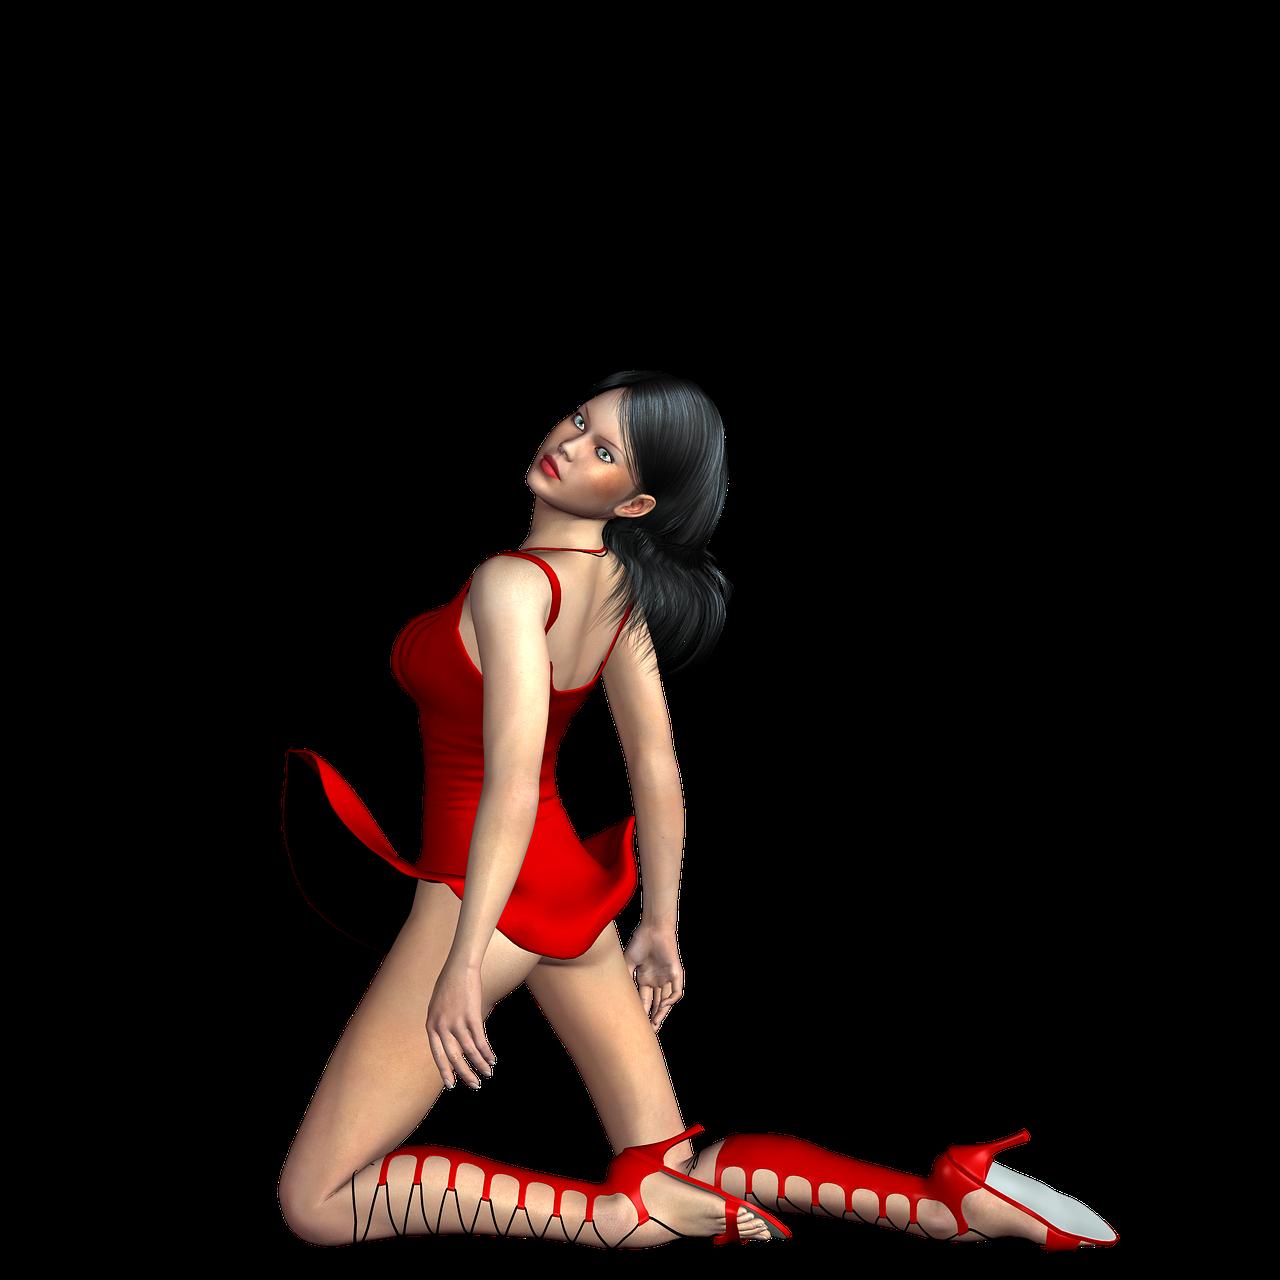 Jeux Porno Virtuel